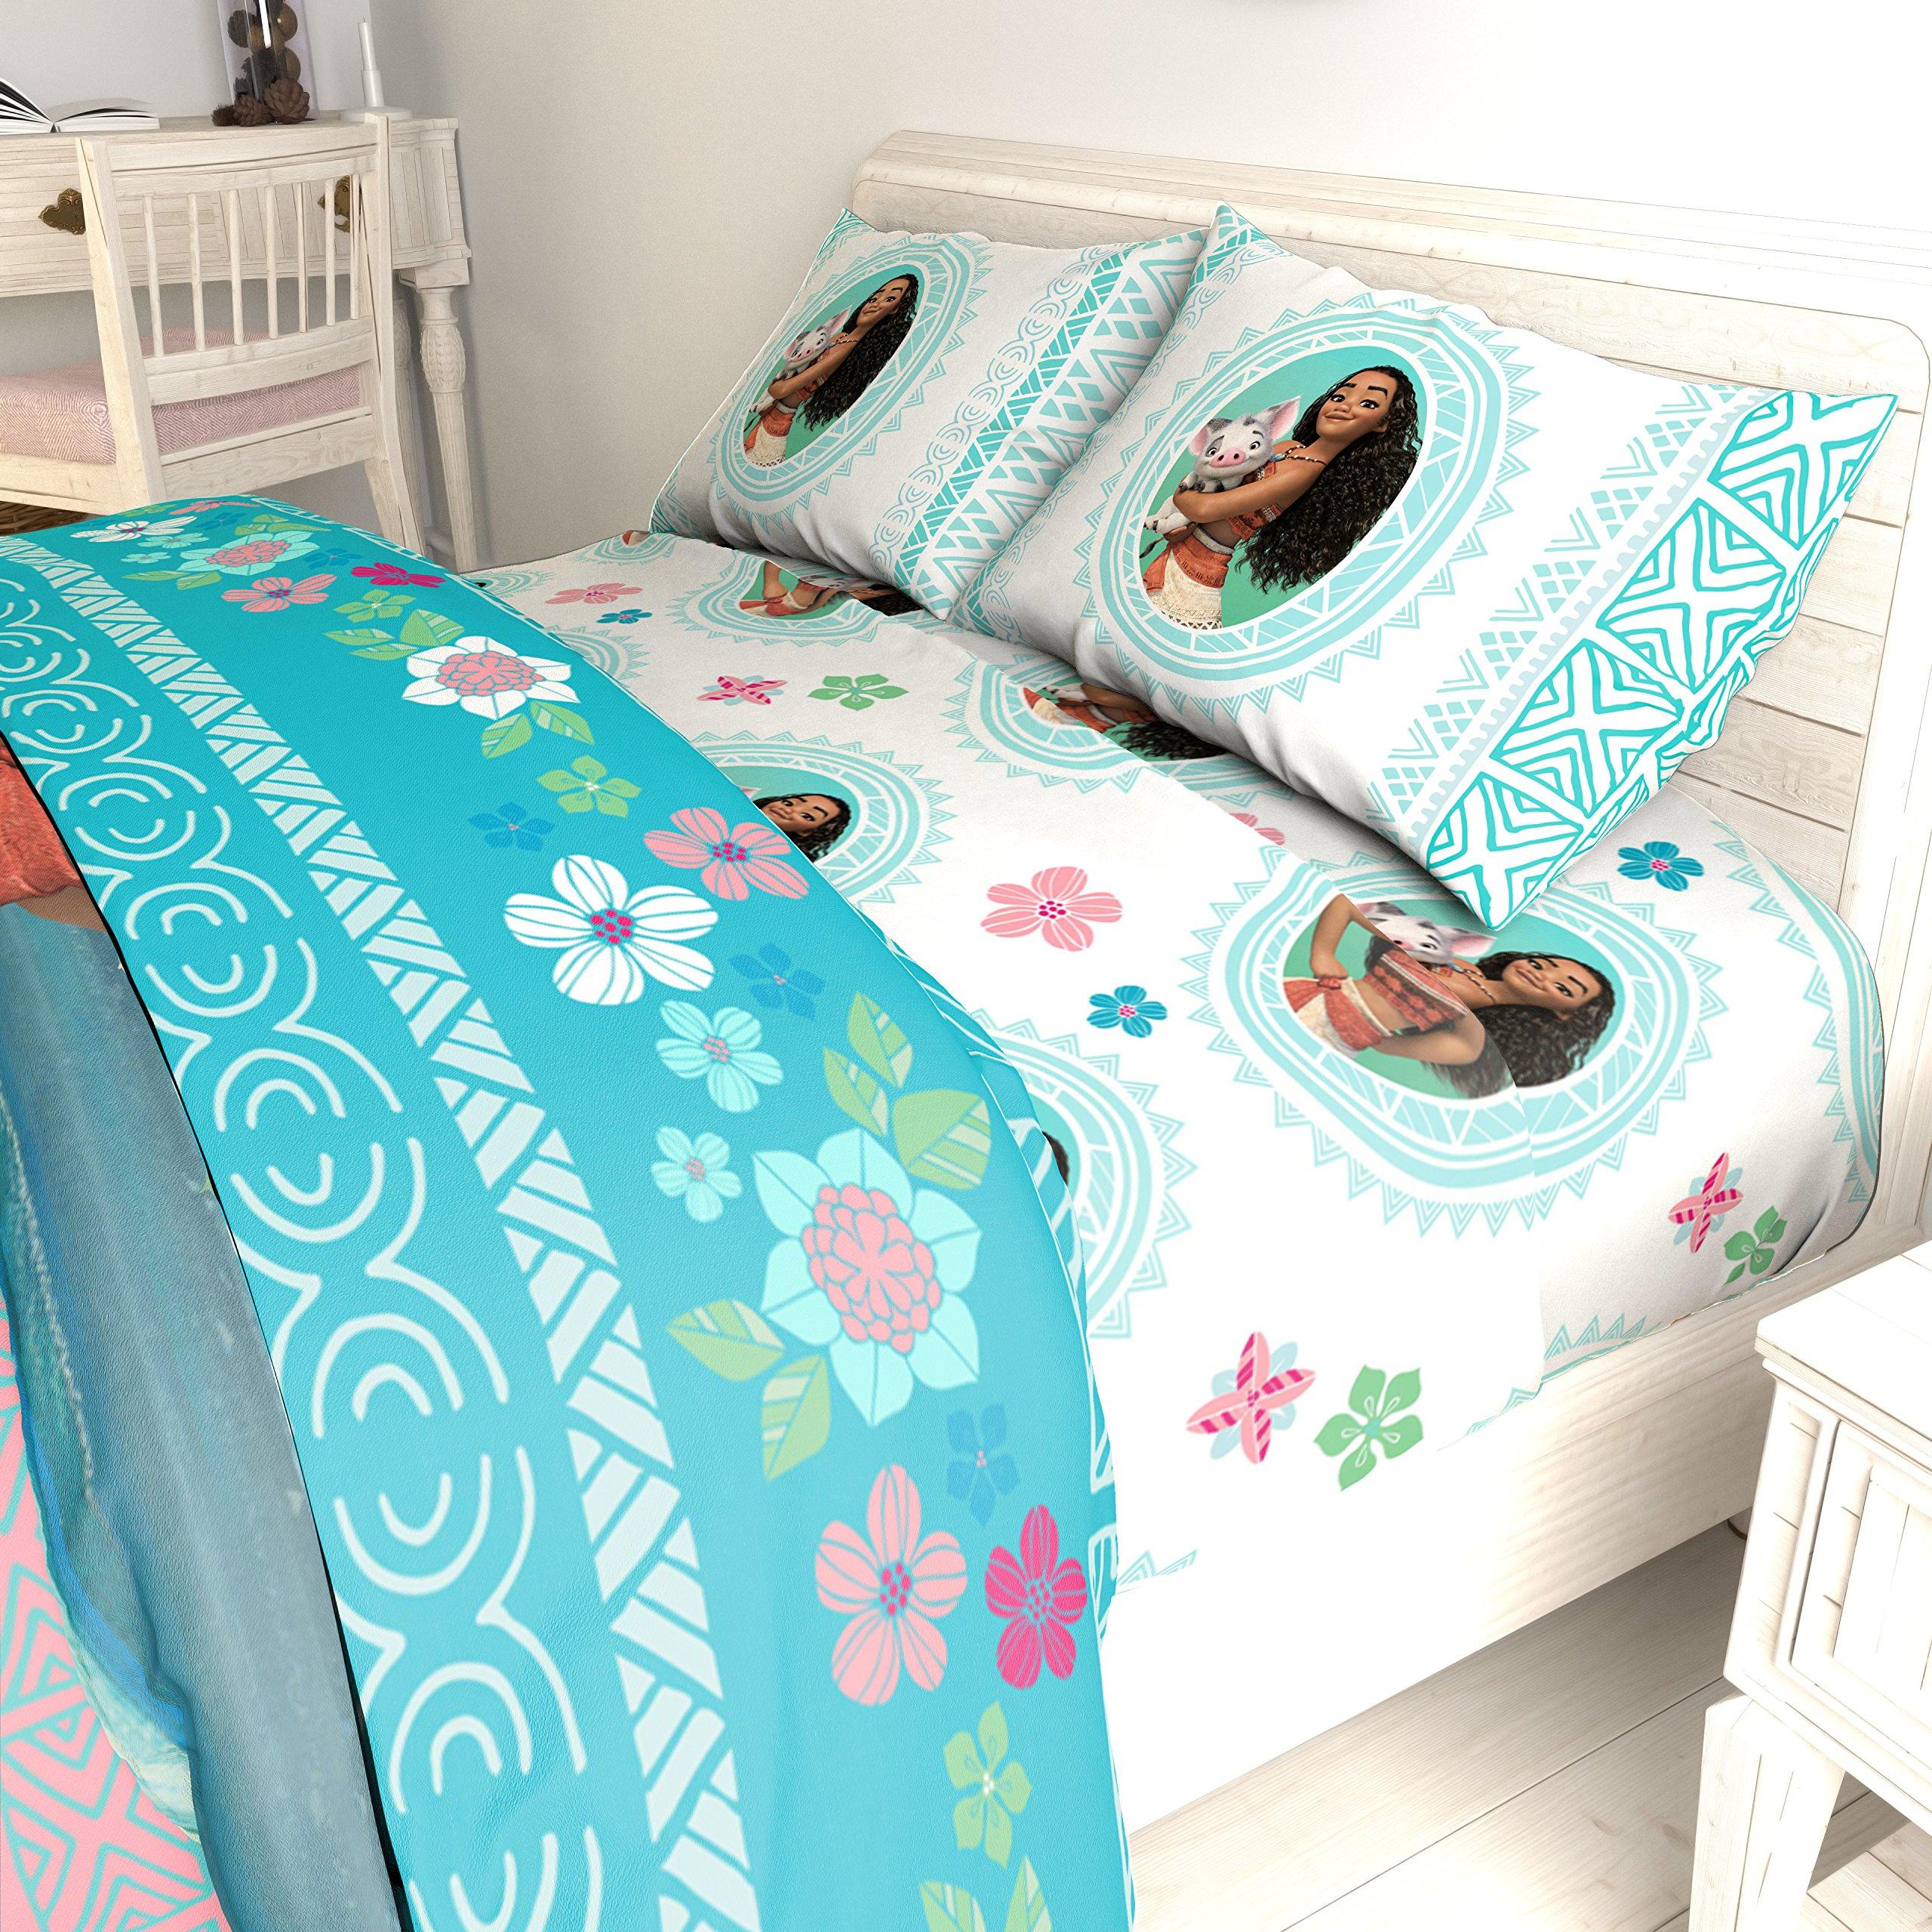 LO 5 Piece Kids Girls Blue Cute Disney Moana Comforter Twin/Full Set, Adorable Hawaii Bedding Children Beach Themed Flowers Movie Themed Hawaiian Tropical Ocean, Polyester by LO